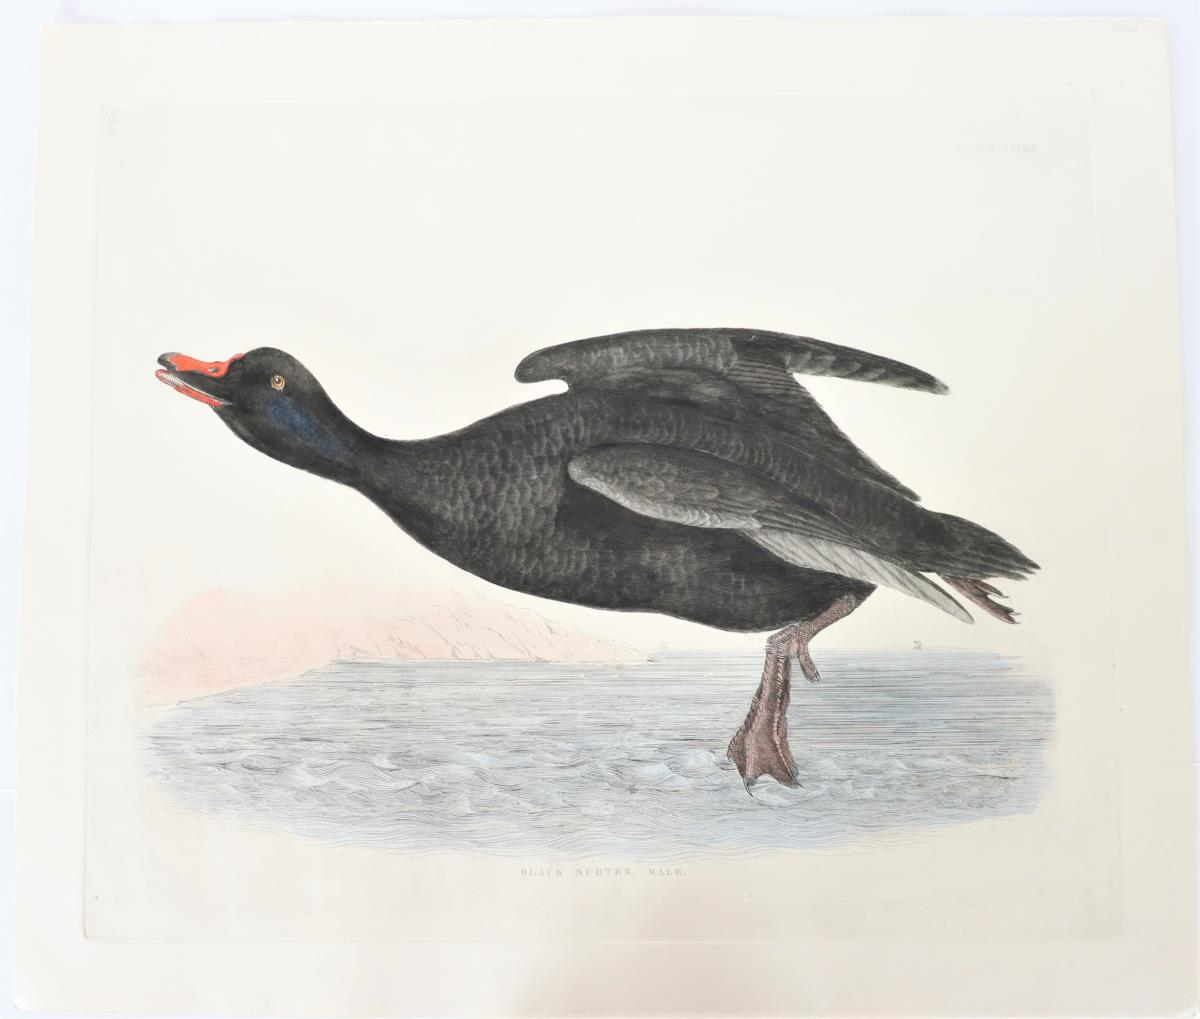 P J Selby, Hand-Colored Engraving, Velvet Scoter